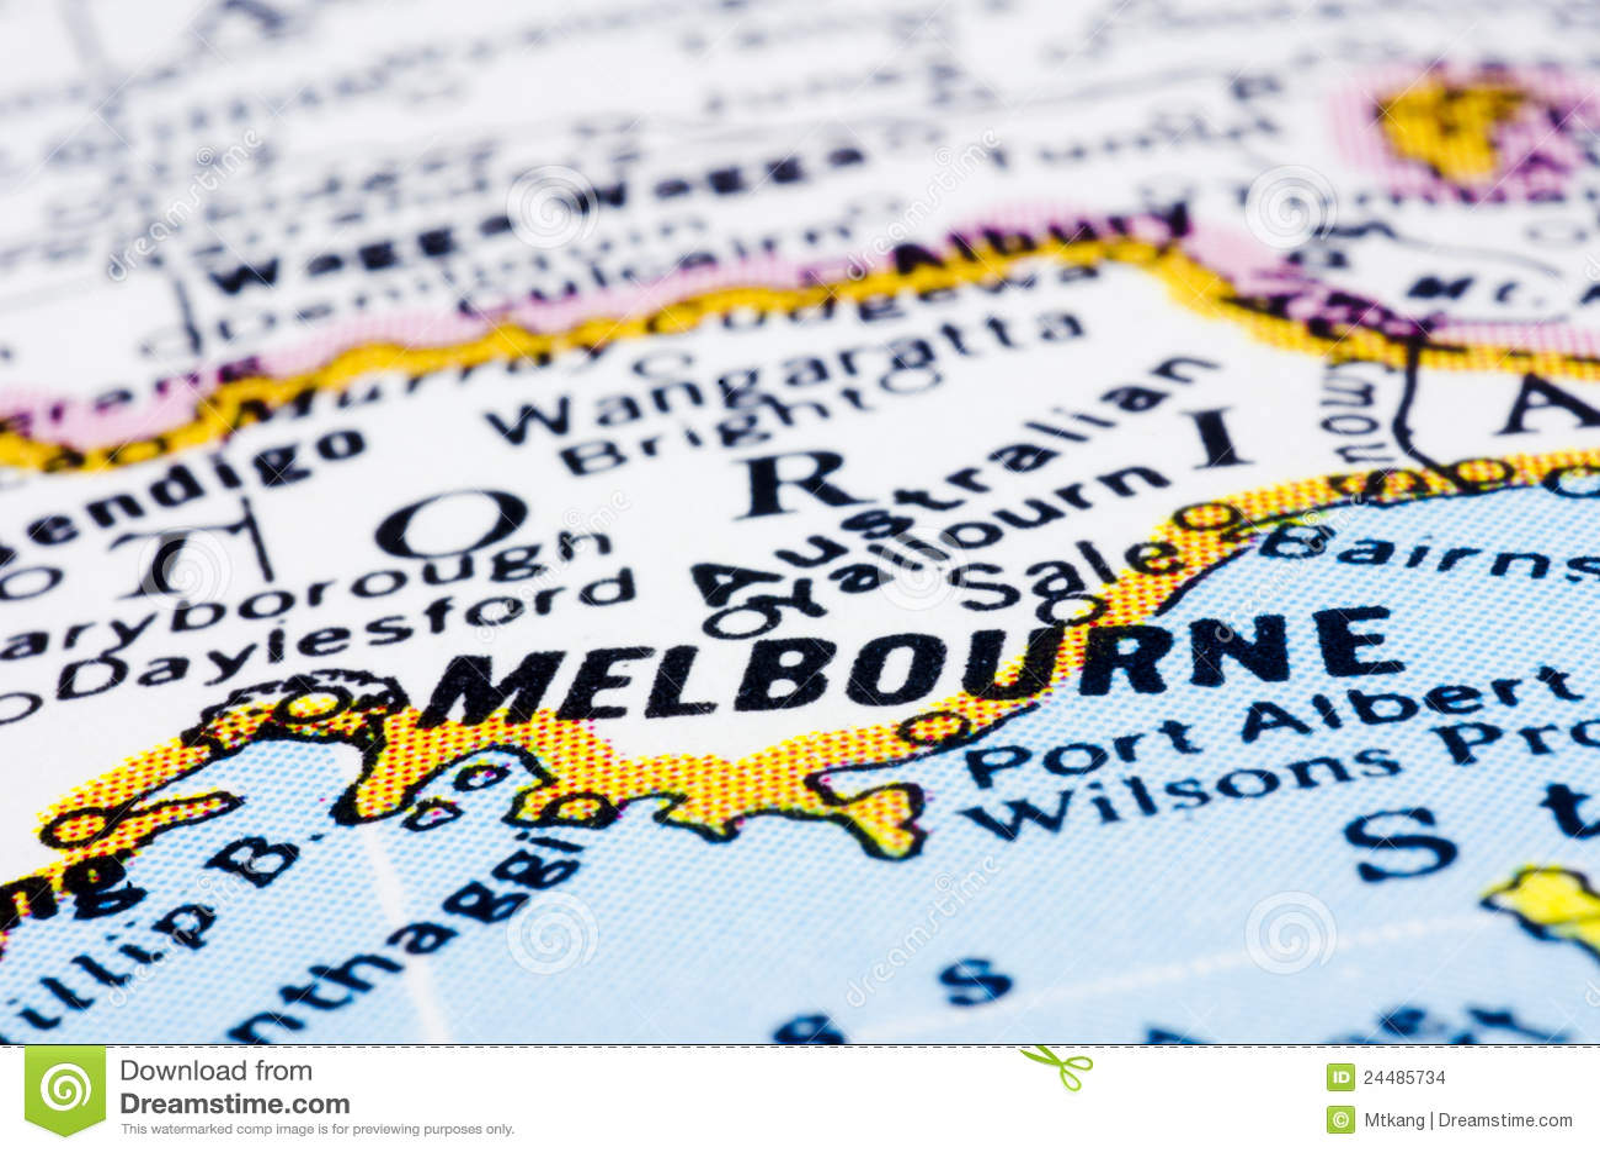 Northstar closing date in Melbourne